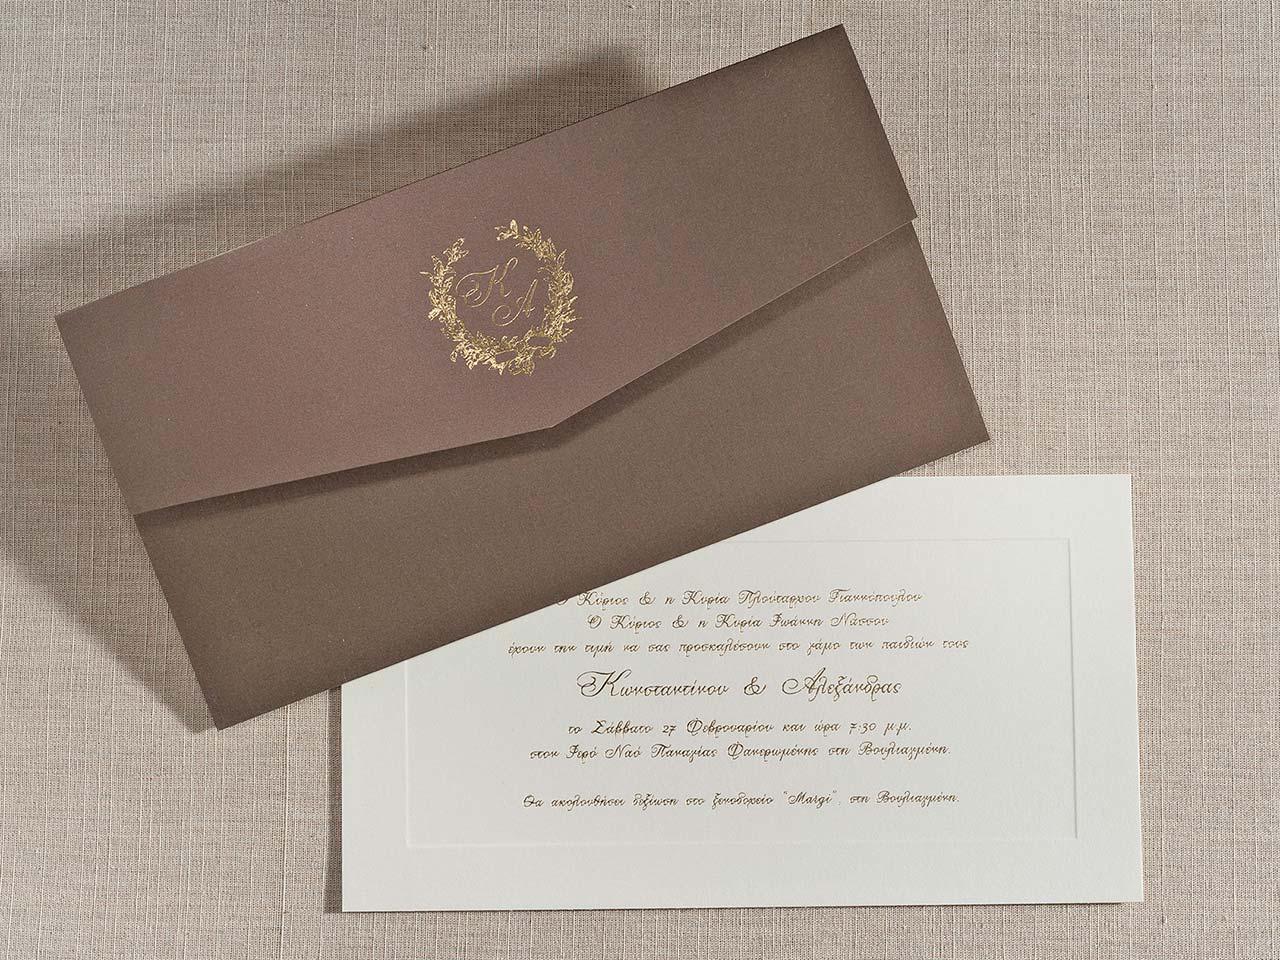 6478fe7515c7 ... Προσκλητήριο Γάμου Καφέ Φάκελος με Χρυσοτυπία. 🔍.  prosklitirio-gamou-kafe-fakelos-me-xrisotipia-bin2164